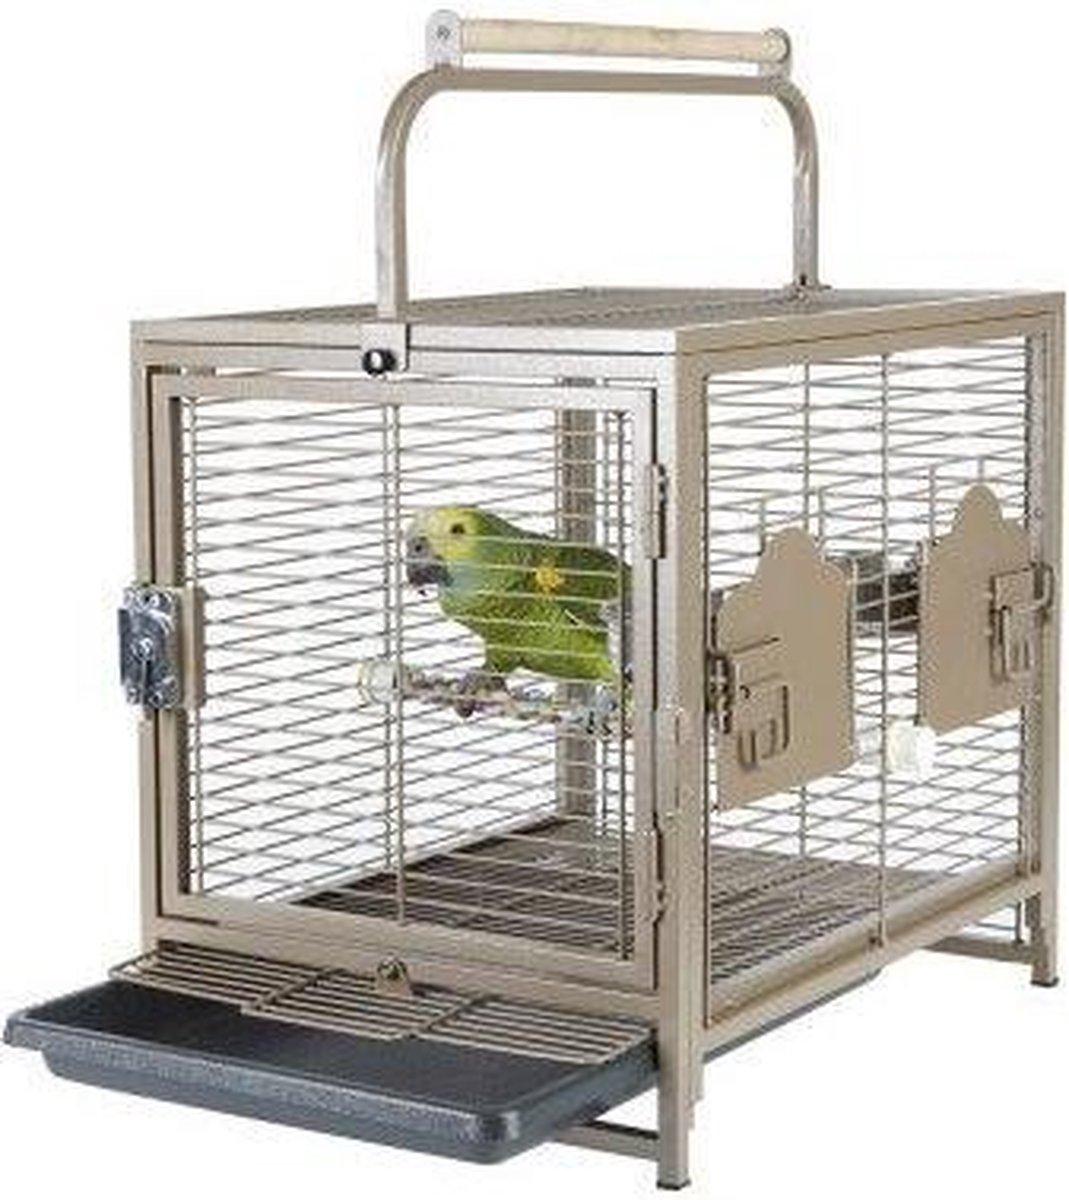 Rainforest Cages Travellor Transportkooi